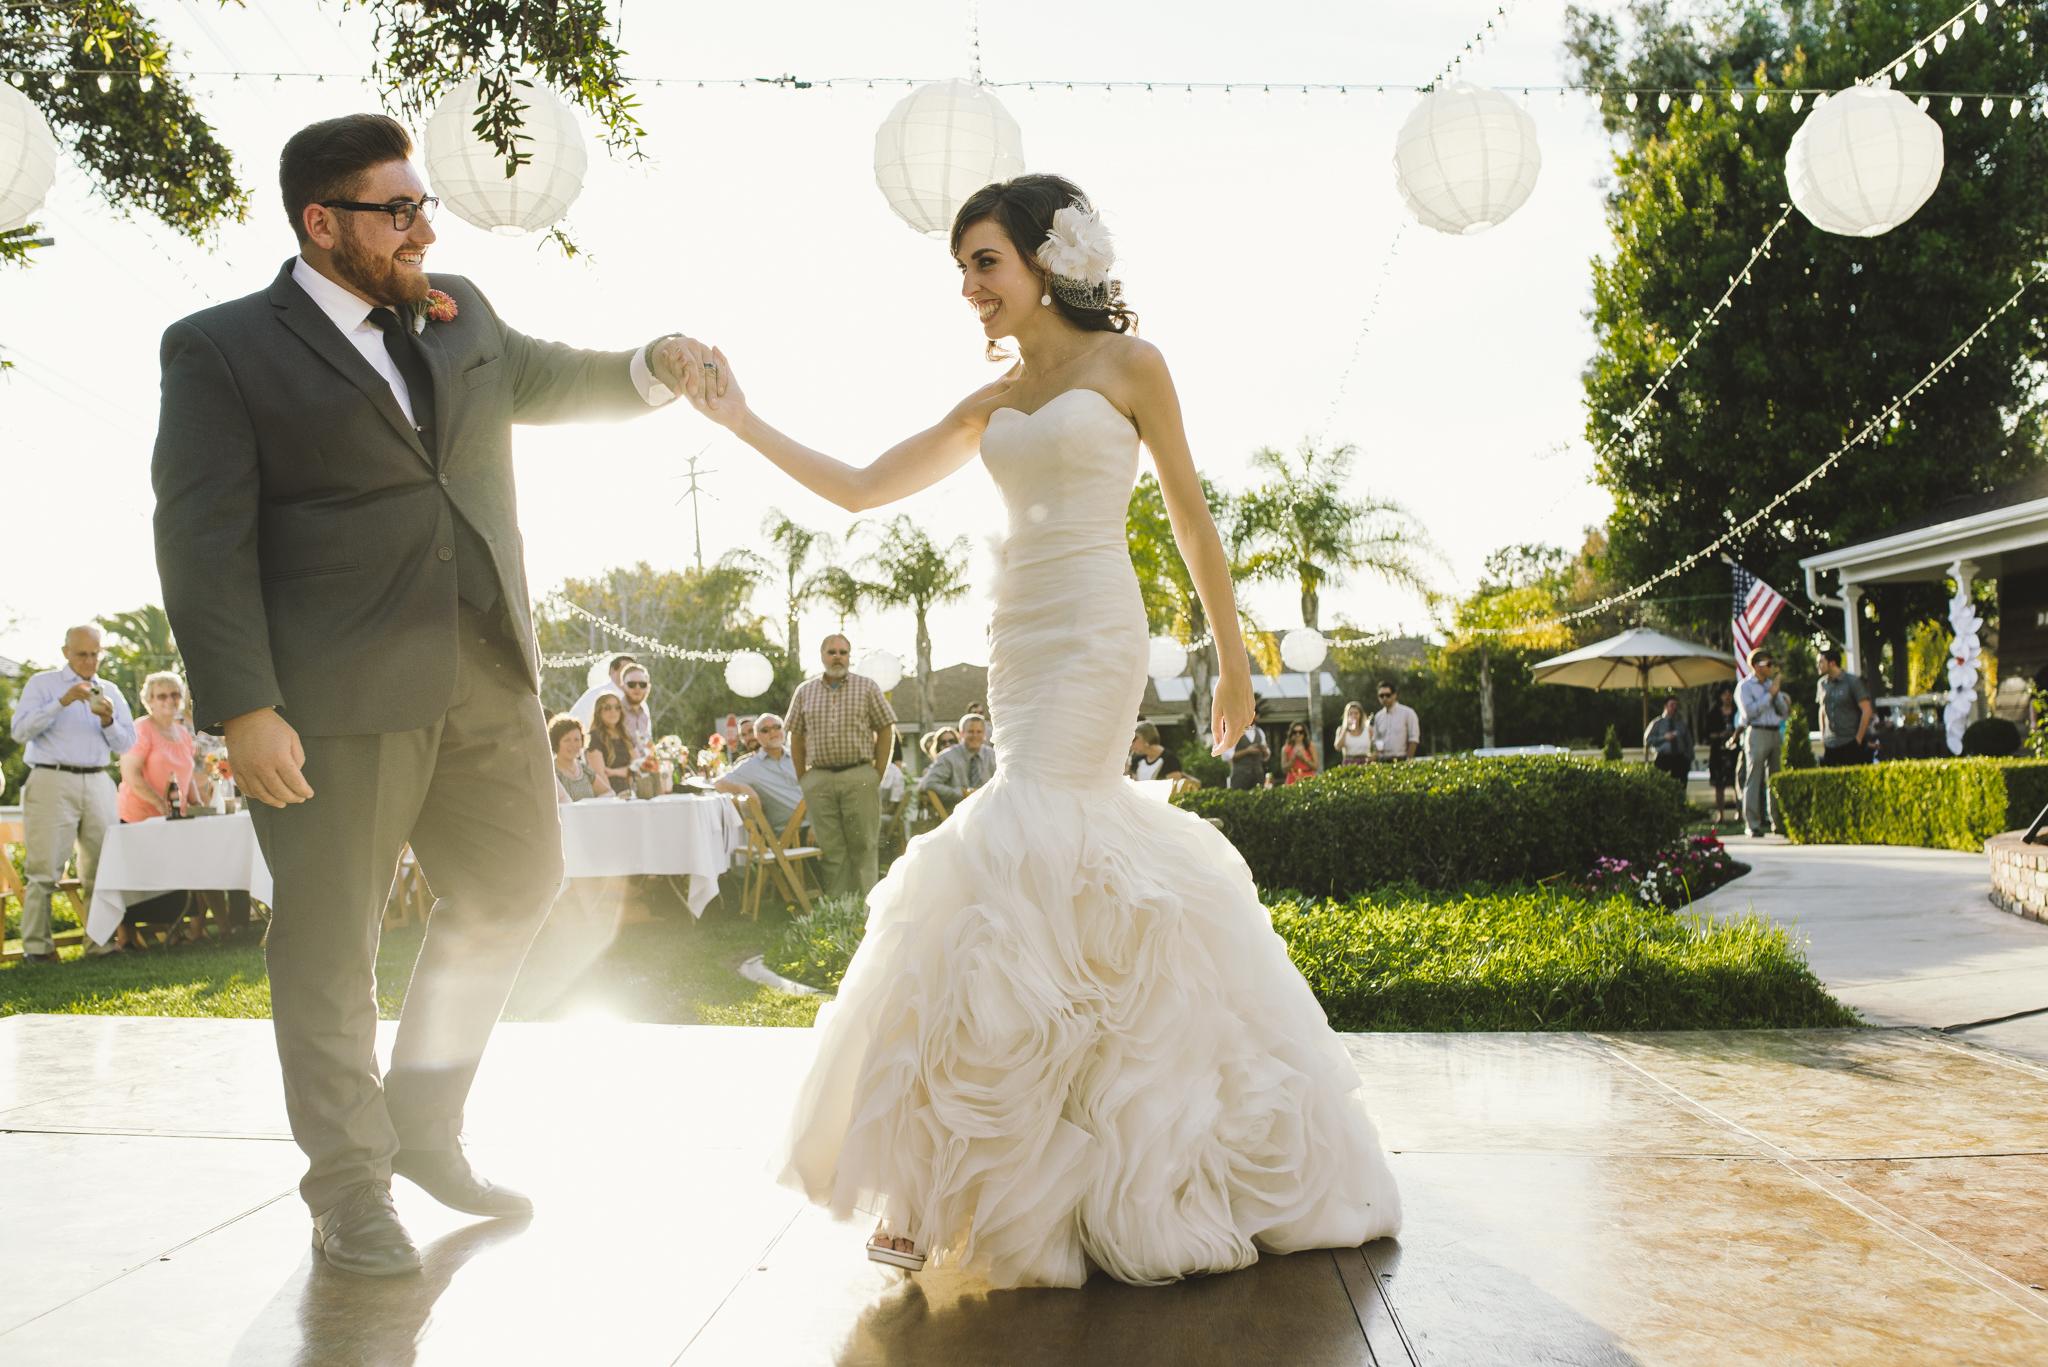 Isaiah & Taylor Photography - Los Angeles Lifestyle Wedding Photographer-45.jpg